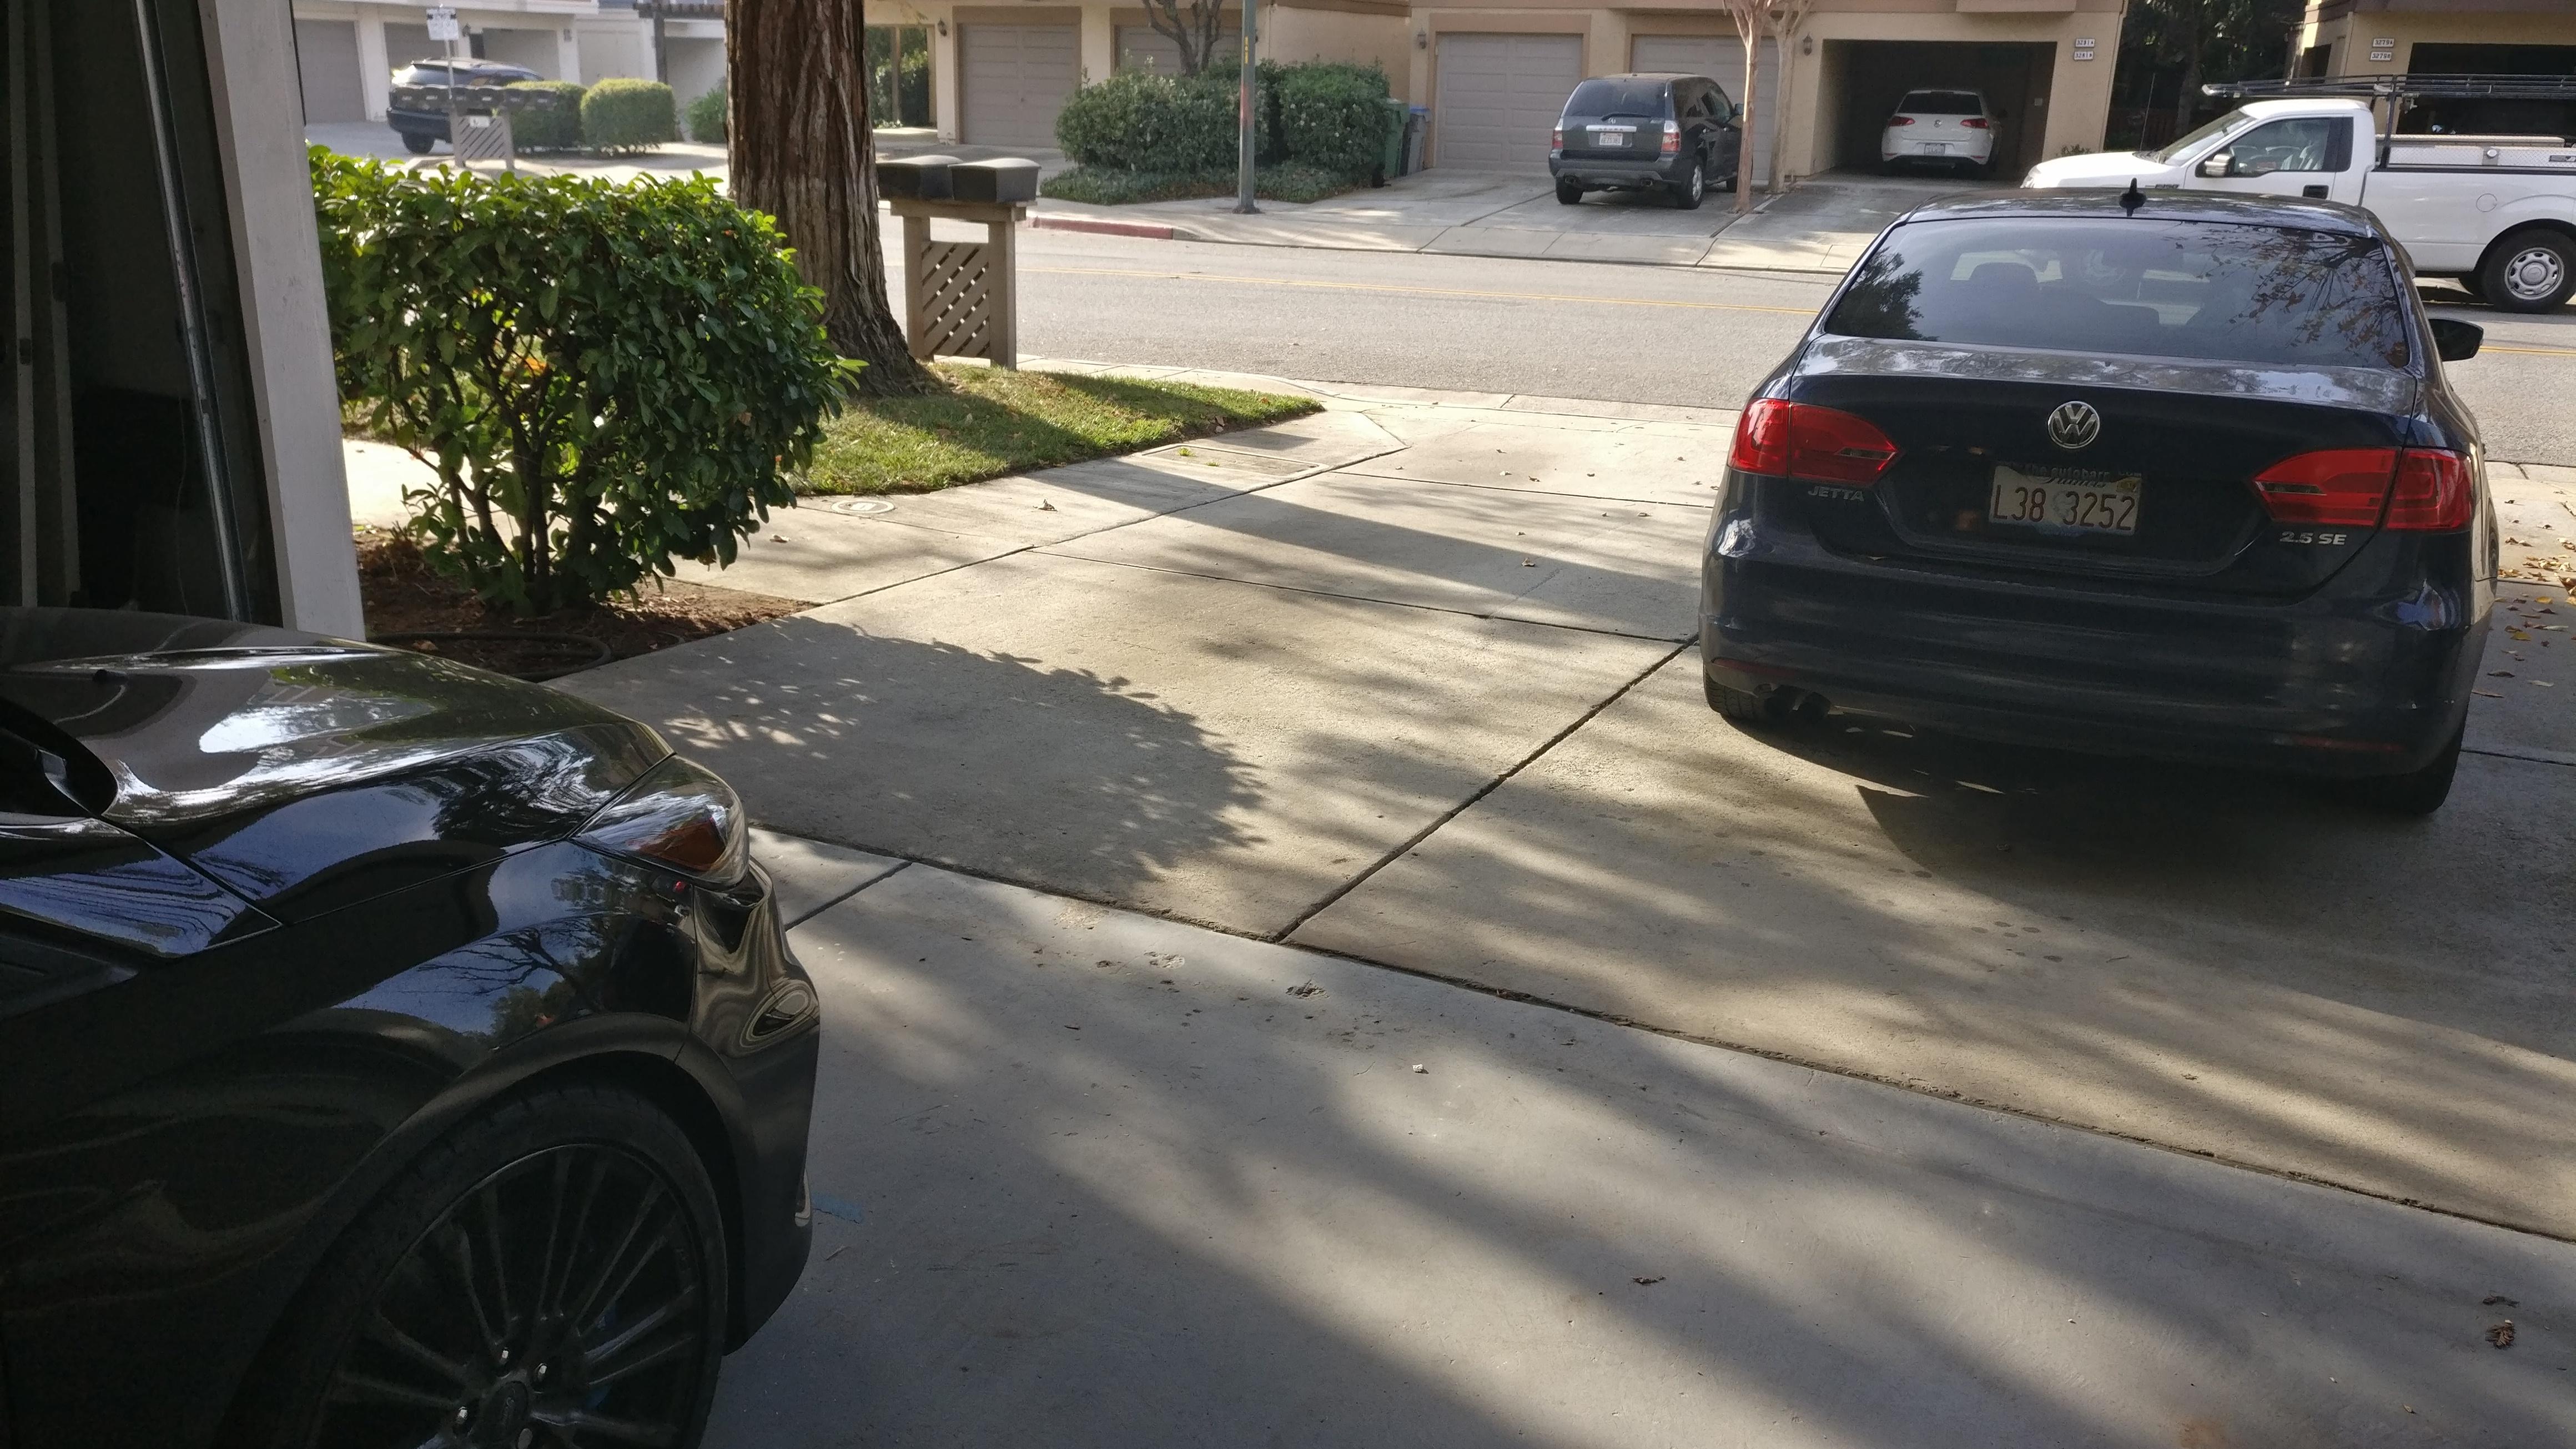 Car Wash San Jose >> 2018 San Jose California Car Wash Restrictions Water Diversion Tactics